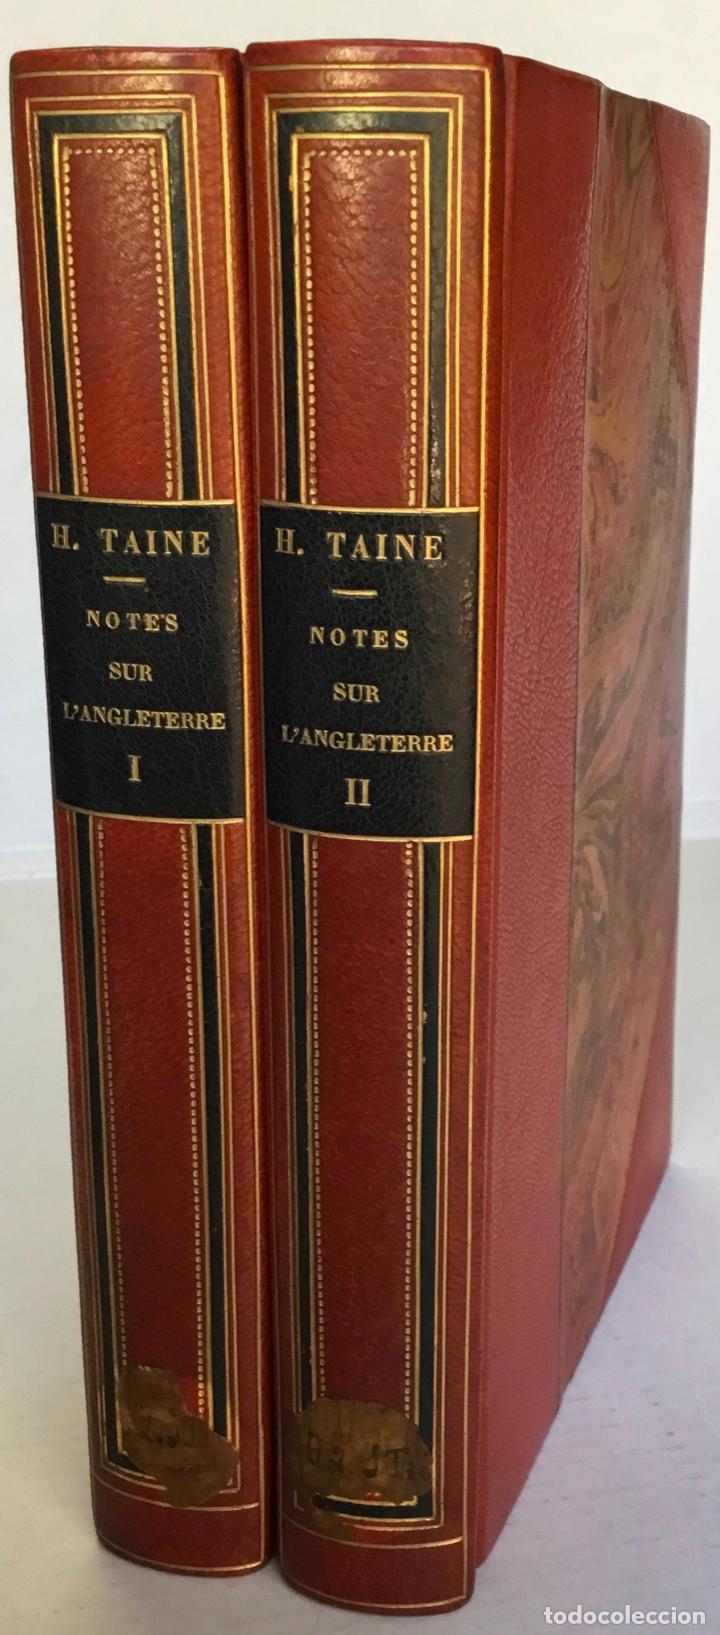 NOTES SUR L'ANGLETERRE. - TAINE, HIPPOLYTE. (Libros Antiguos, Raros y Curiosos - Pensamiento - Política)